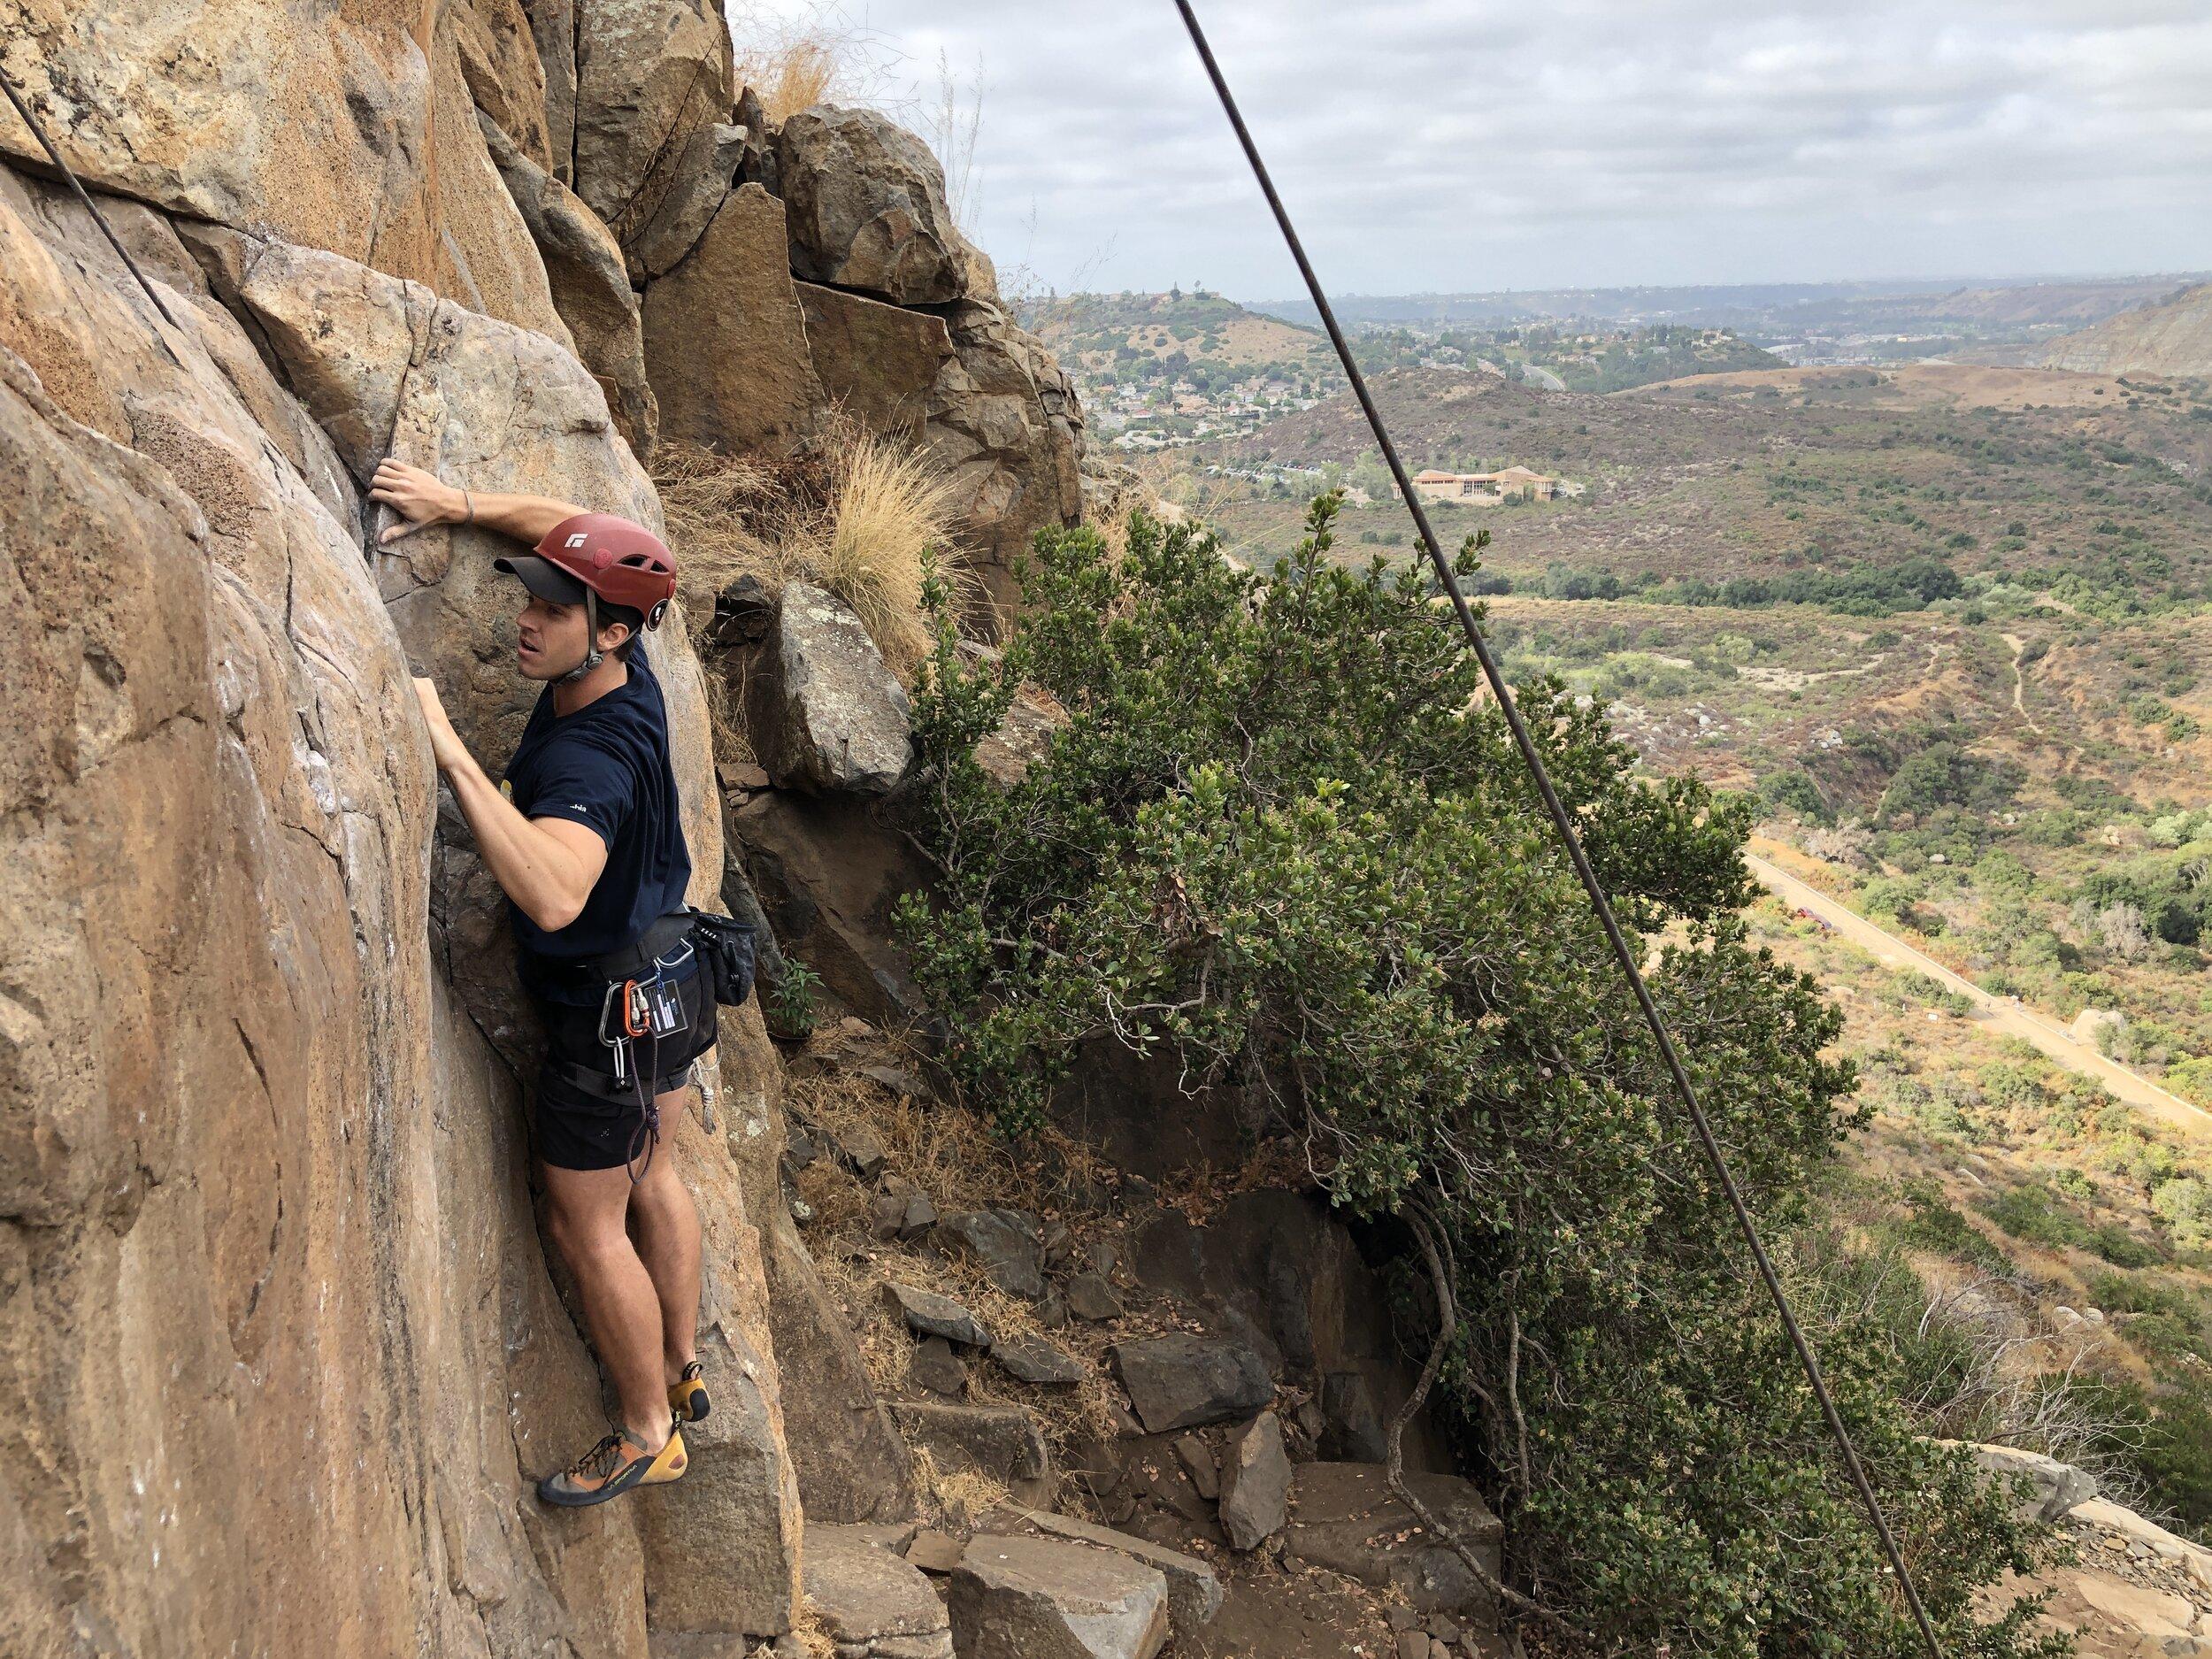 Mission Gorge Rock Climbing San Diego